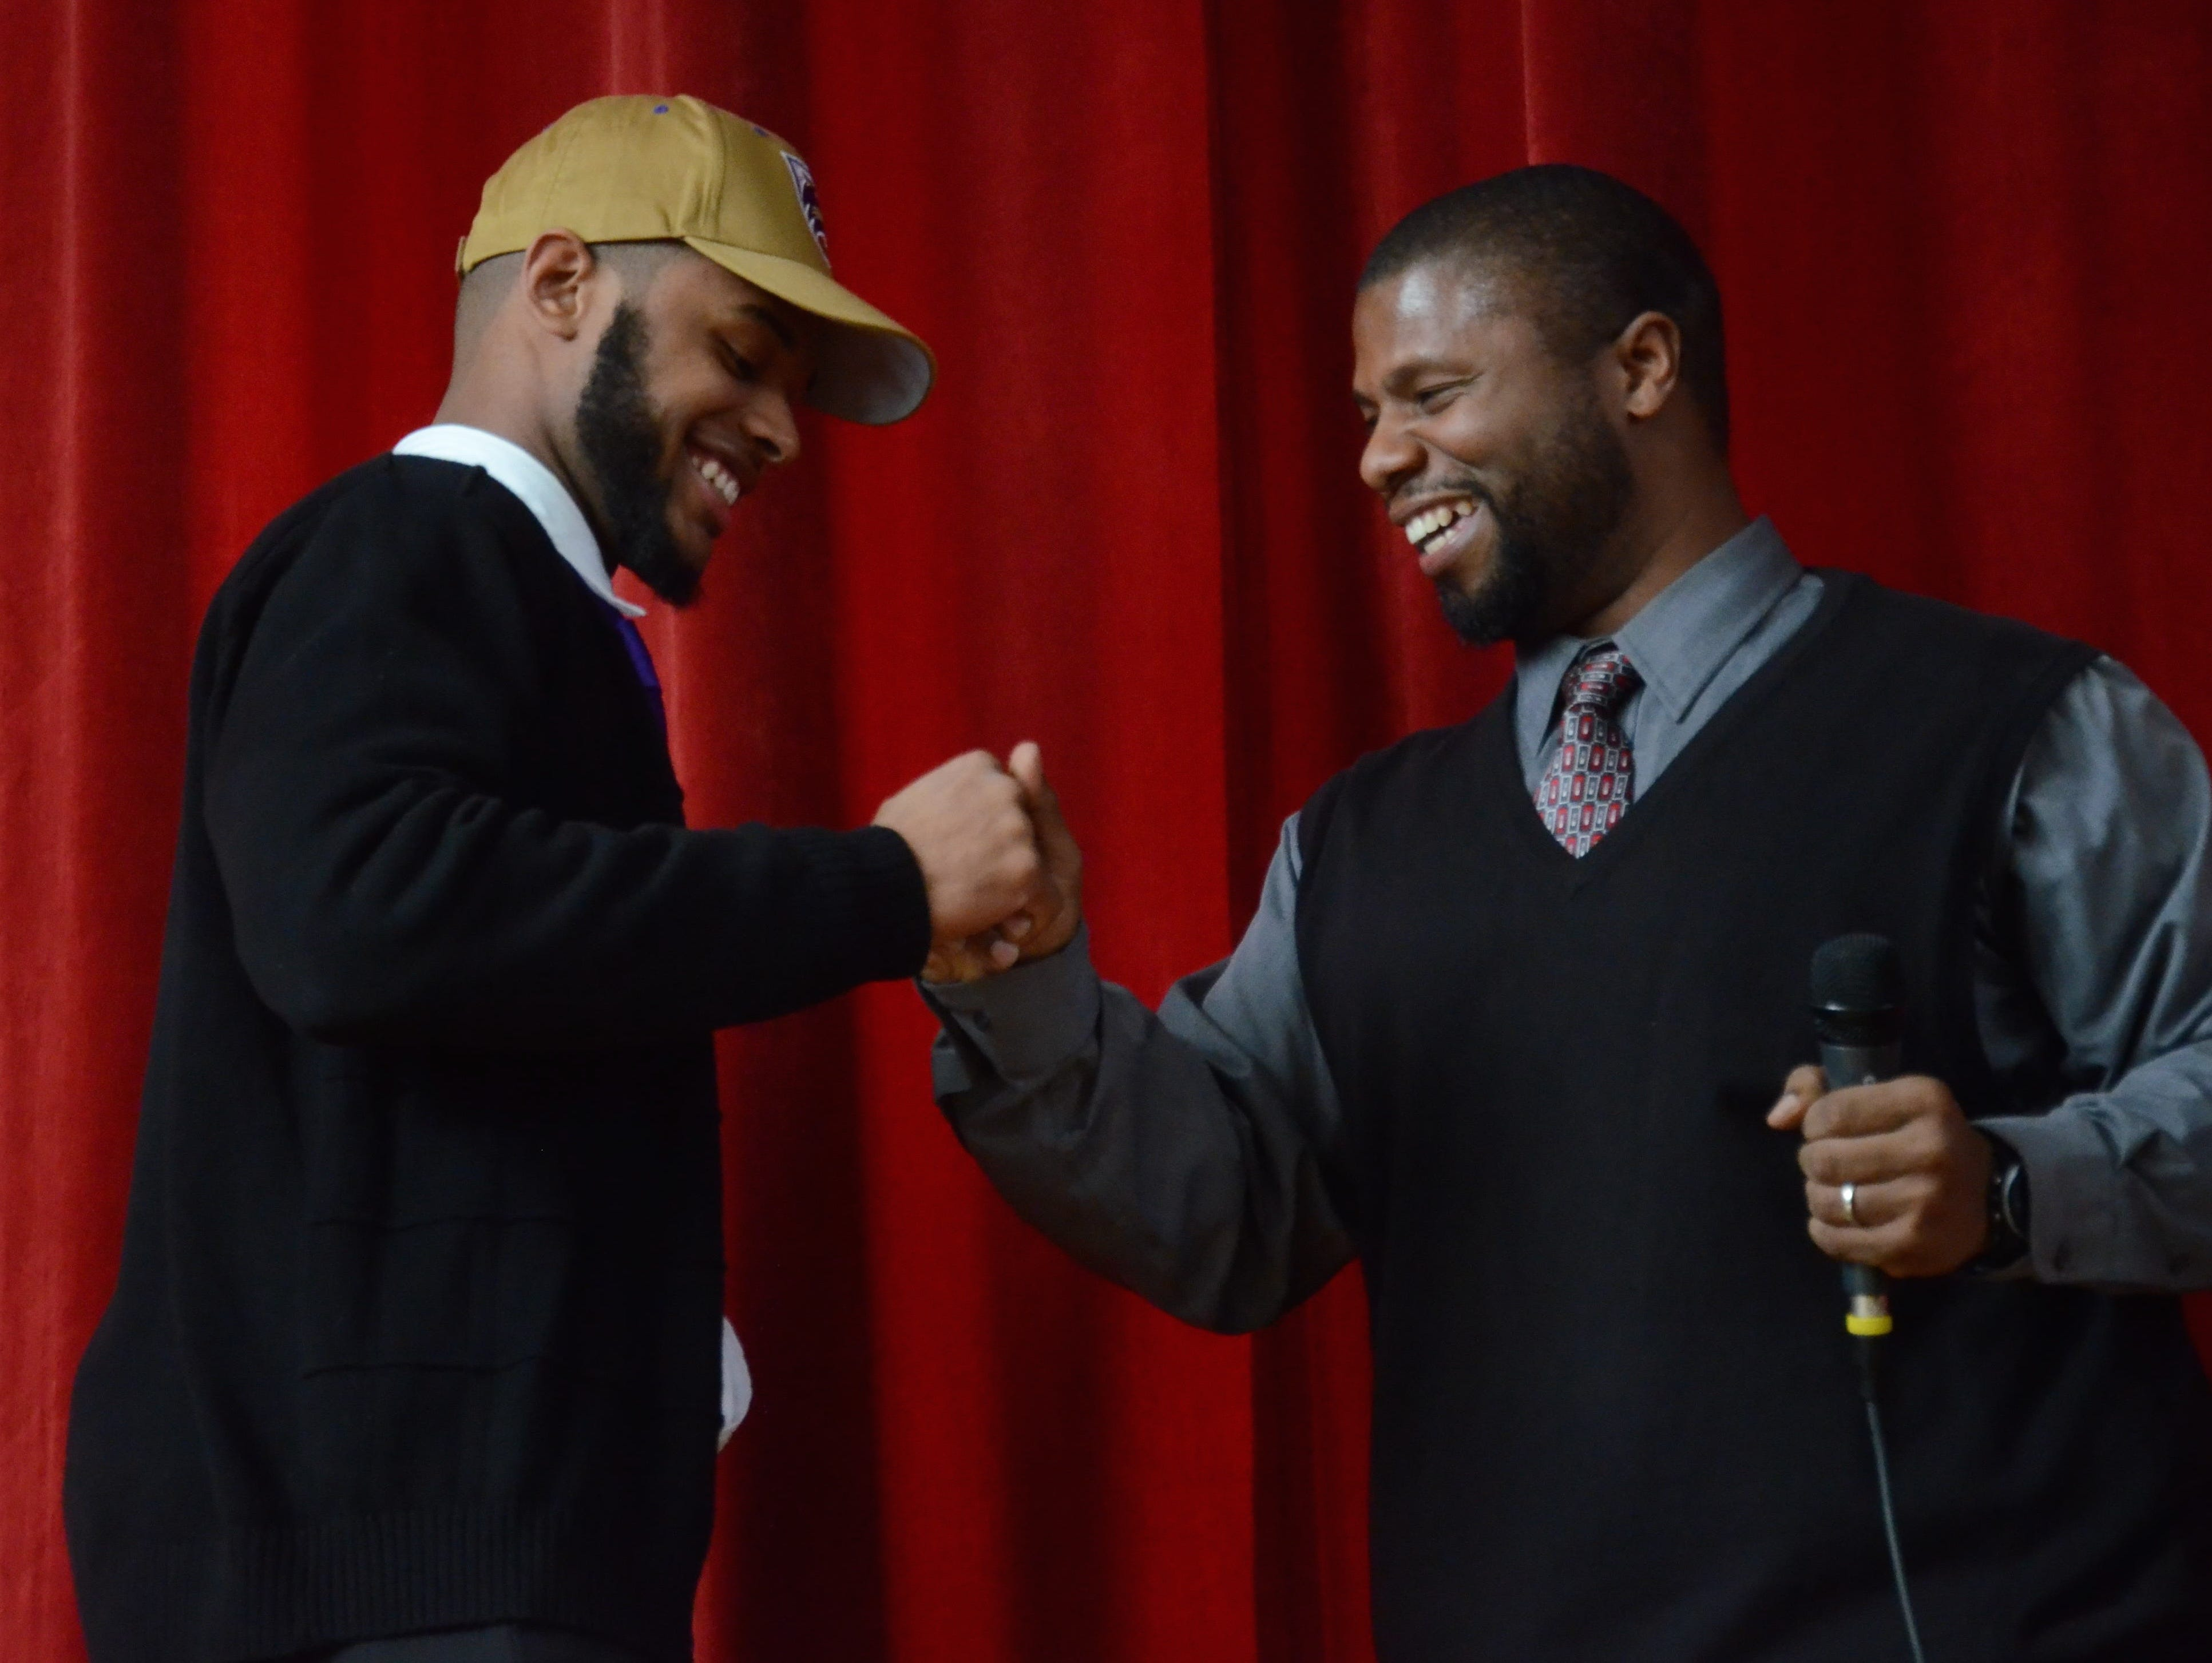 East Nashville coach Brian Waite (right) congratulates senior DeVarius Cortner prior to him signing to play football at Western Carolina.